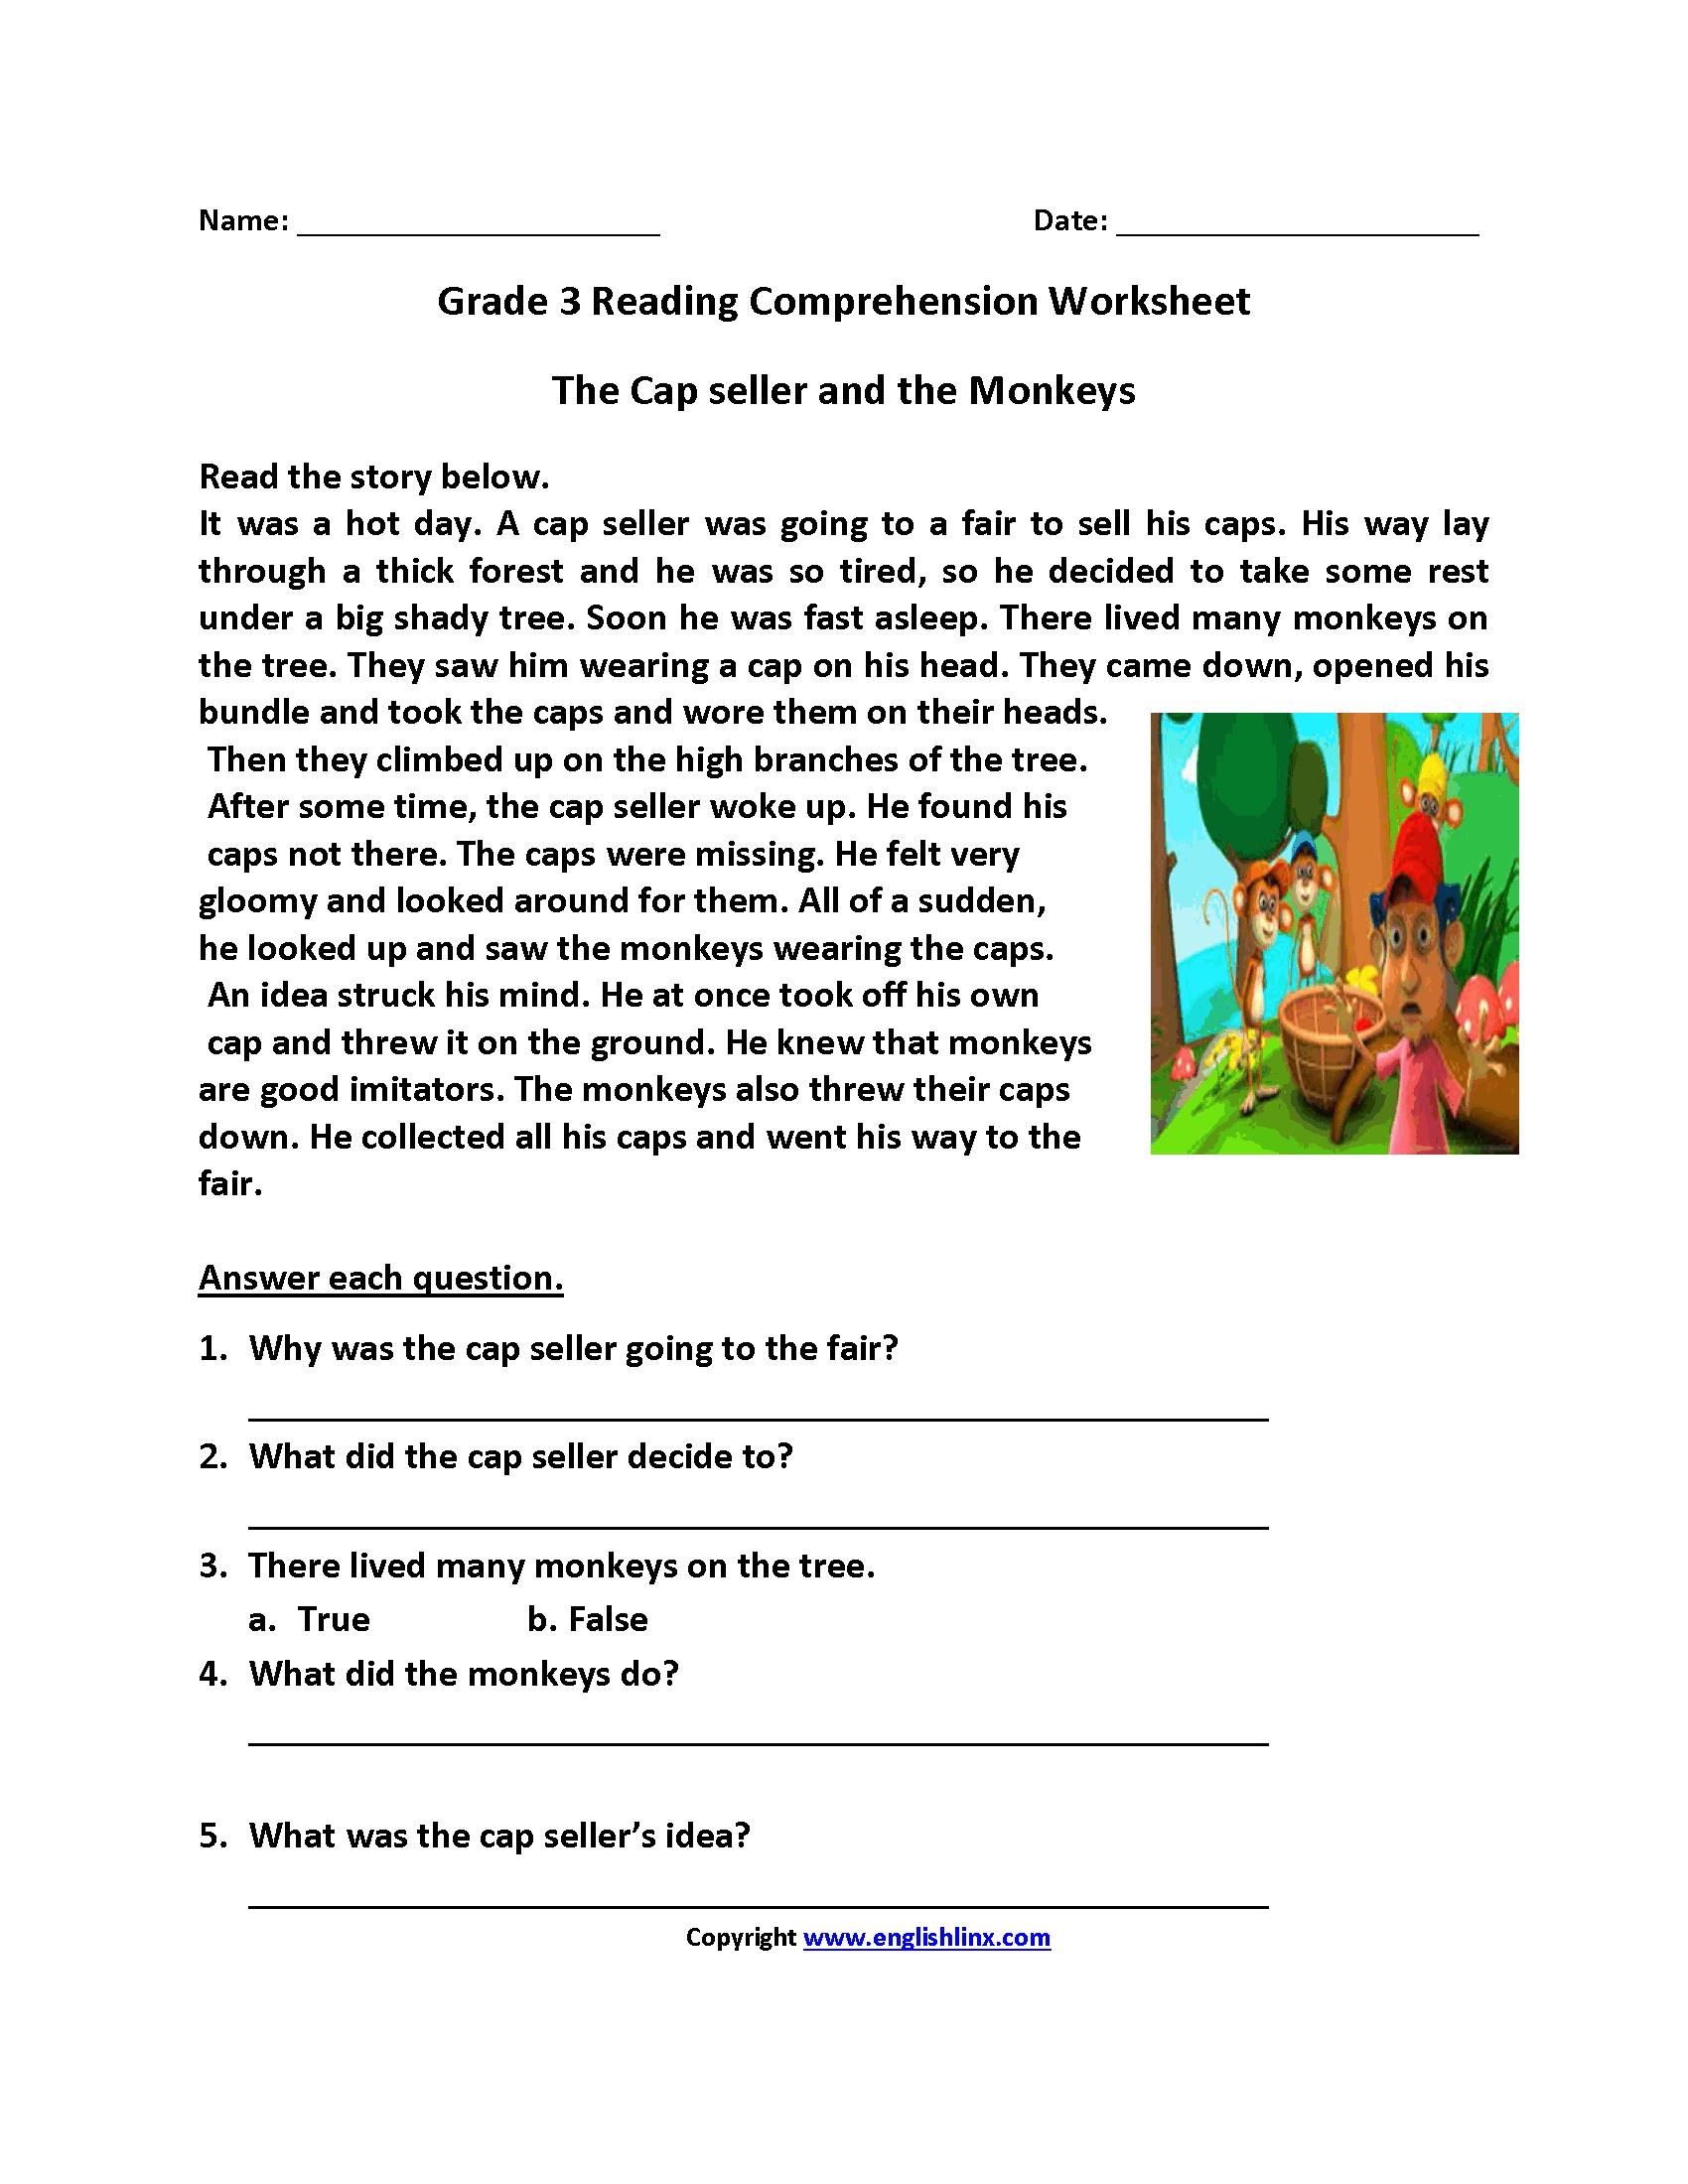 Worksheet Third Grade Comprehension Worksheets Reading Worksheets - Free Printable 3Rd Grade Reading Worksheets